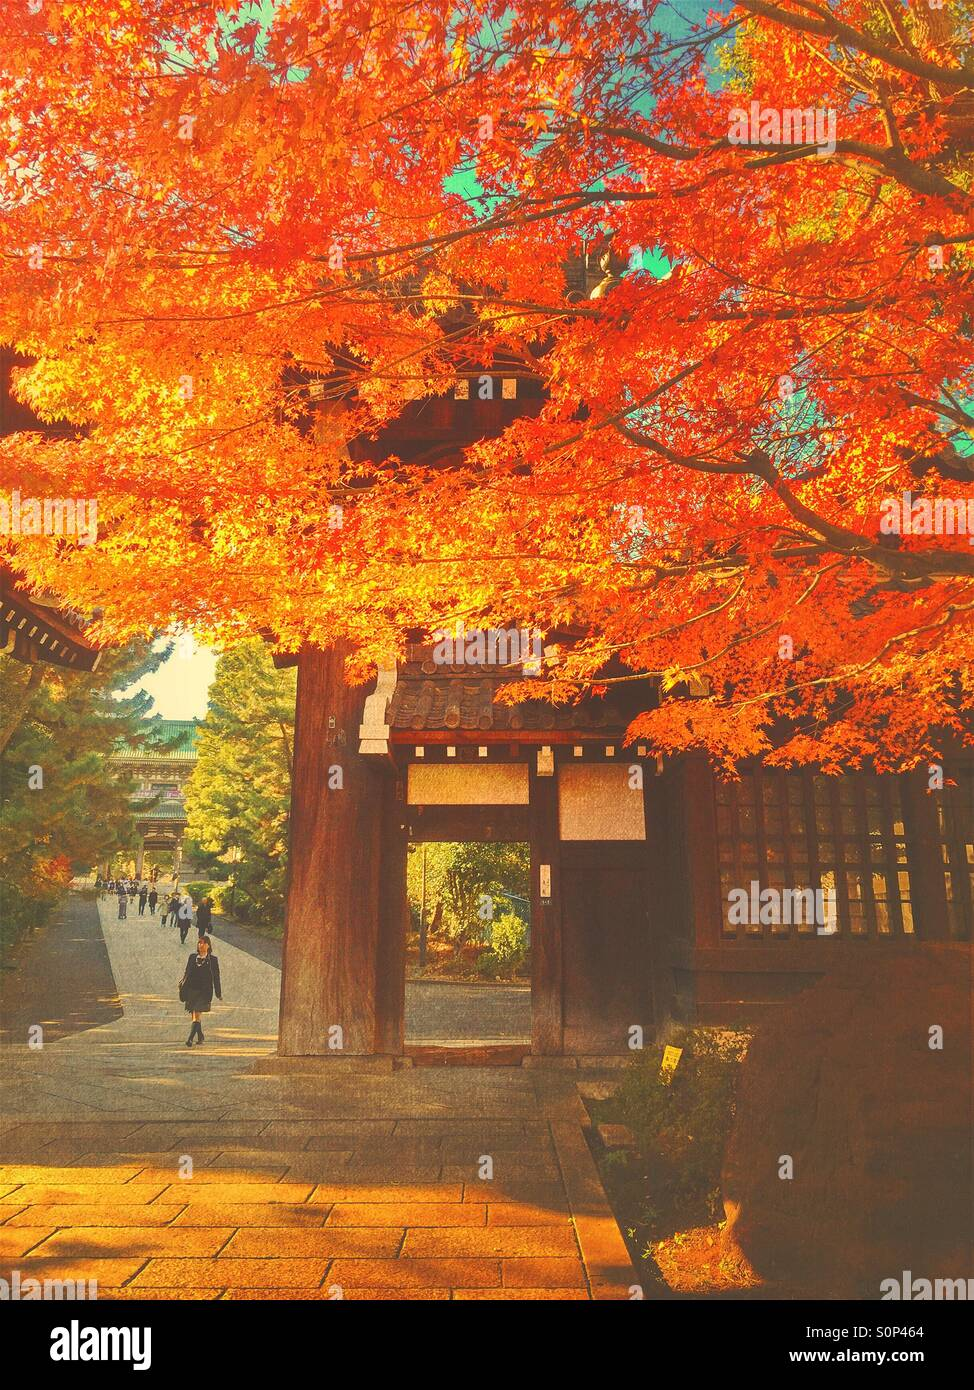 Beautiful fall scene with people and vibrant autumn foliage at Soji-ji Buddhist temple in Yokohama, Japan. Vintage - Stock Image